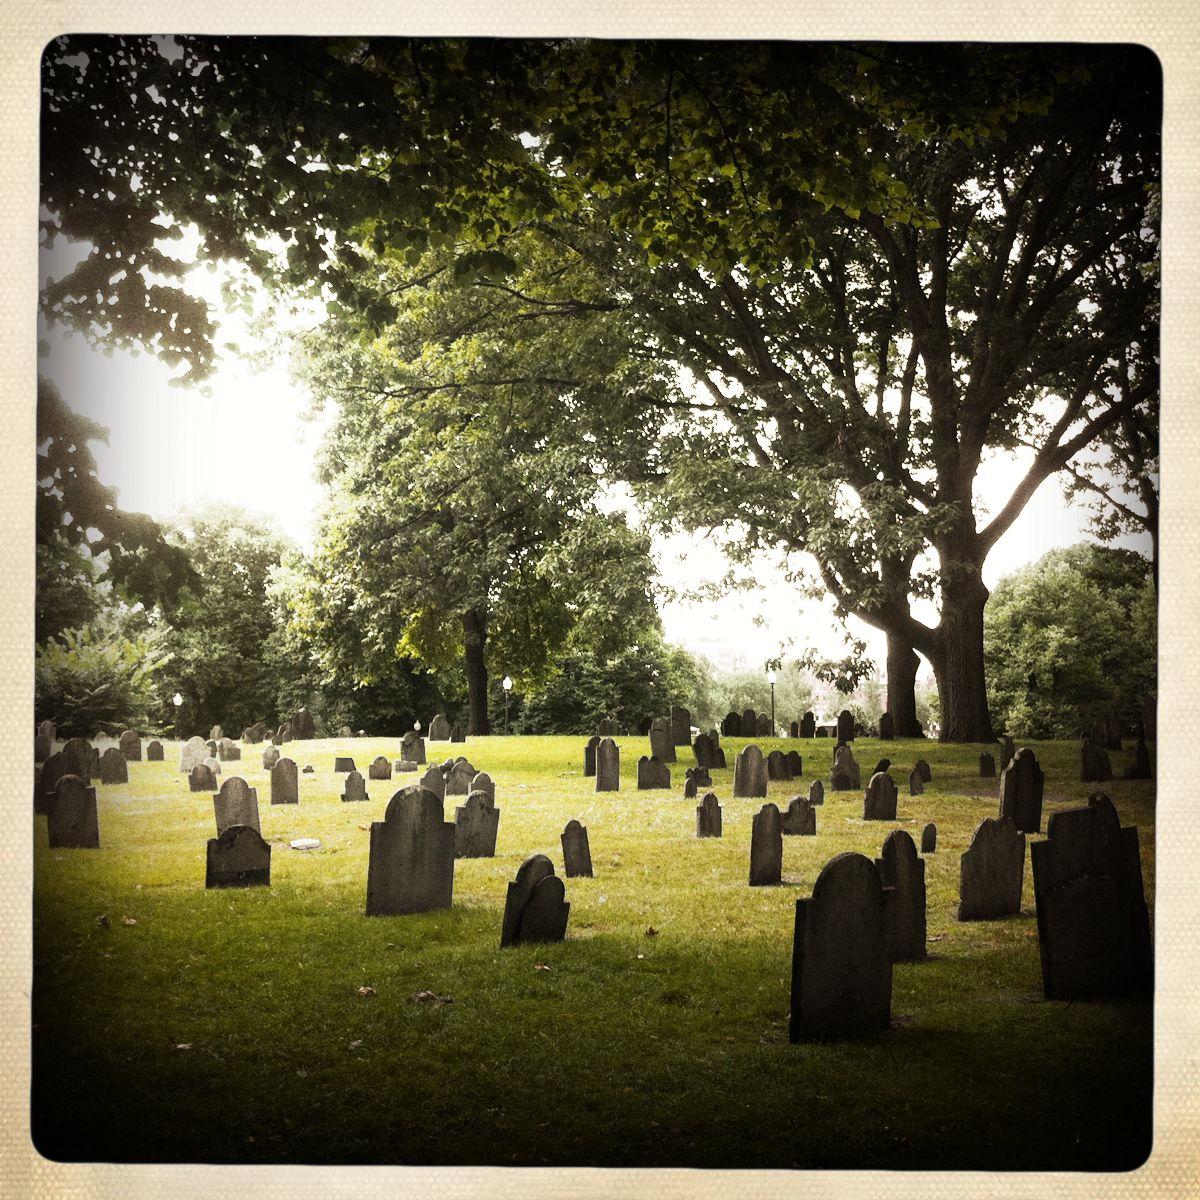 Boston 2011, Photo by EmilyAguilar